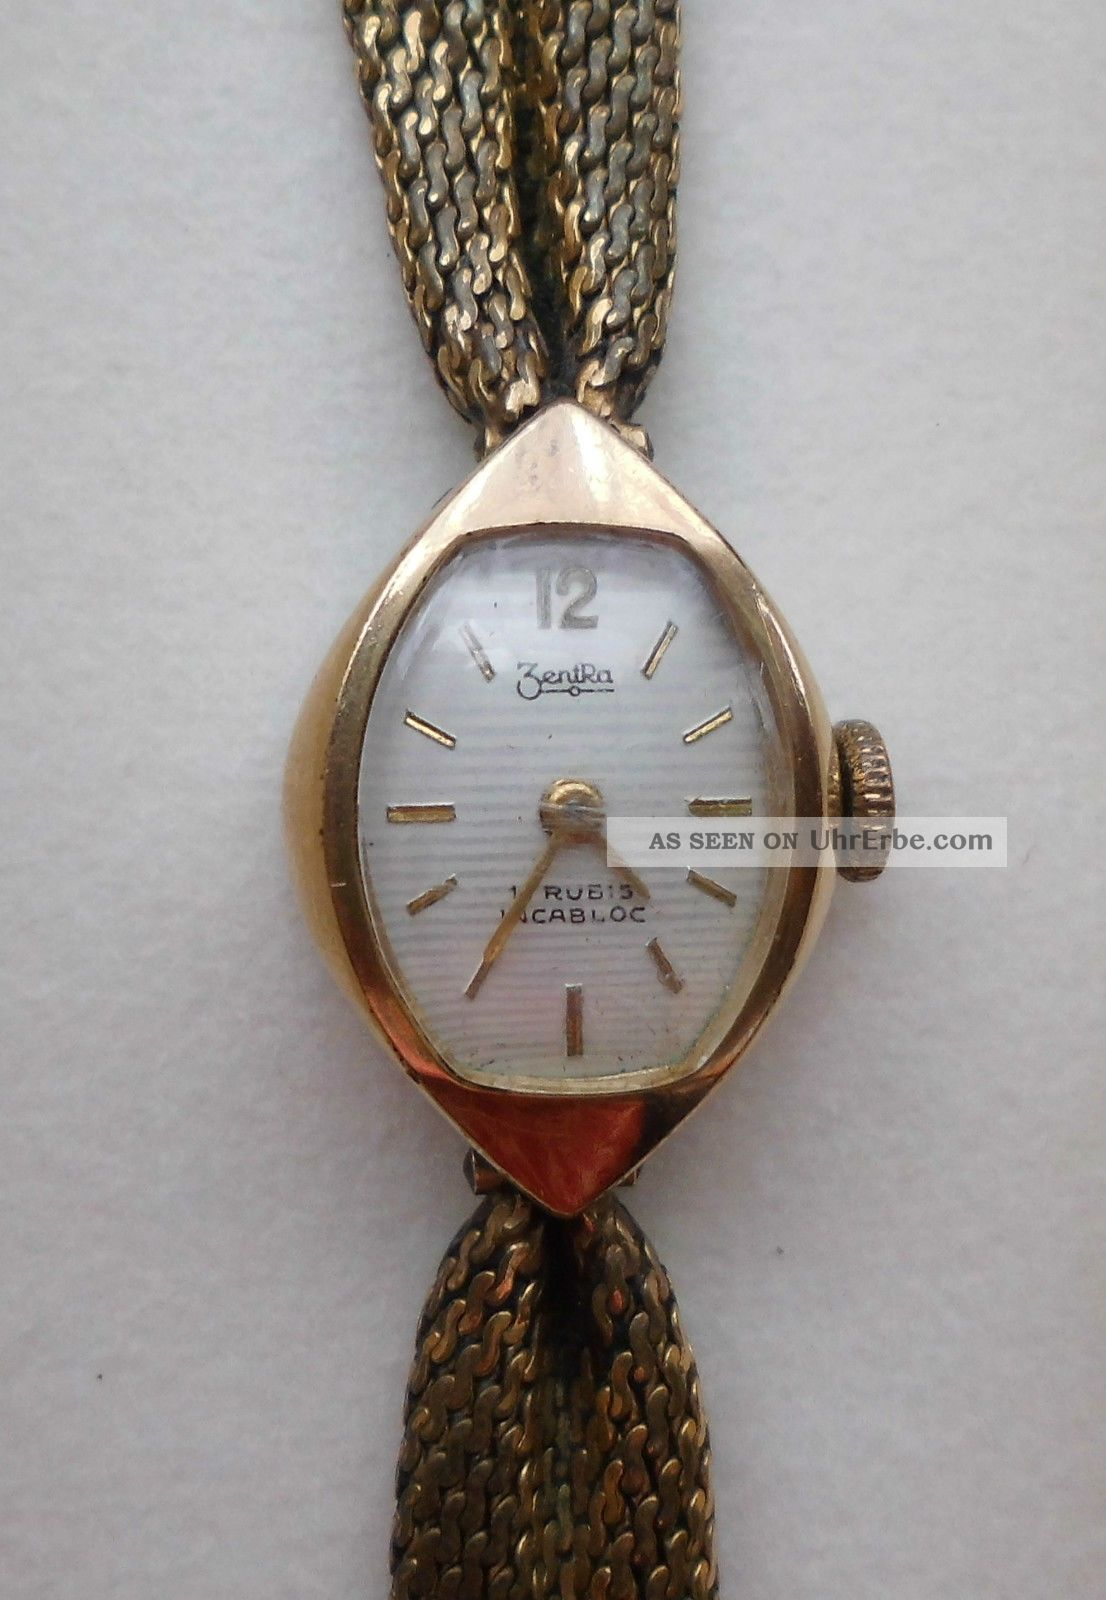 Zentra Incabloc Damen Uhr Gold (läuft) Armbanduhren Bild